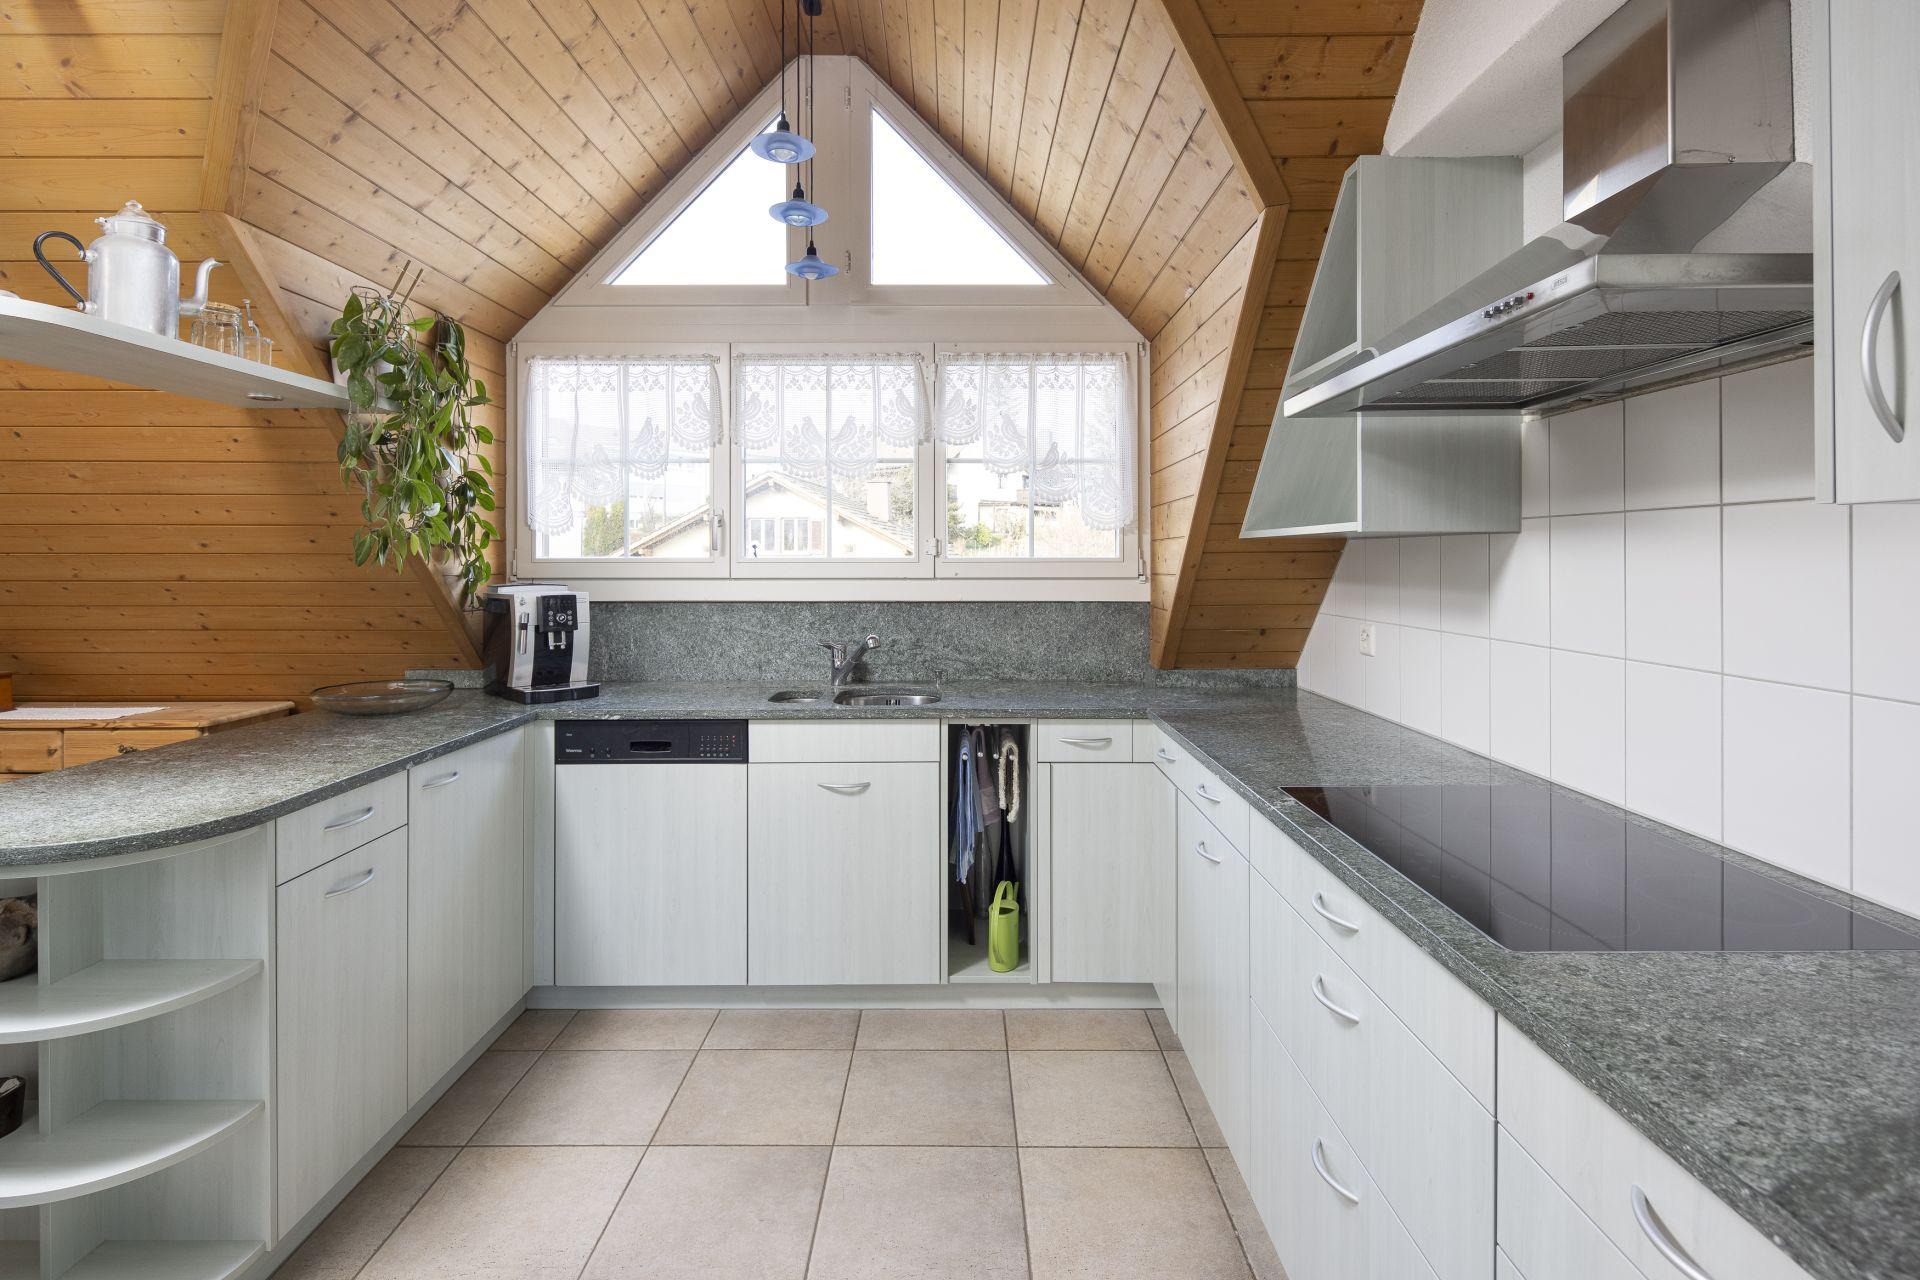 Sonnige Dachmaisonette-Wohnung